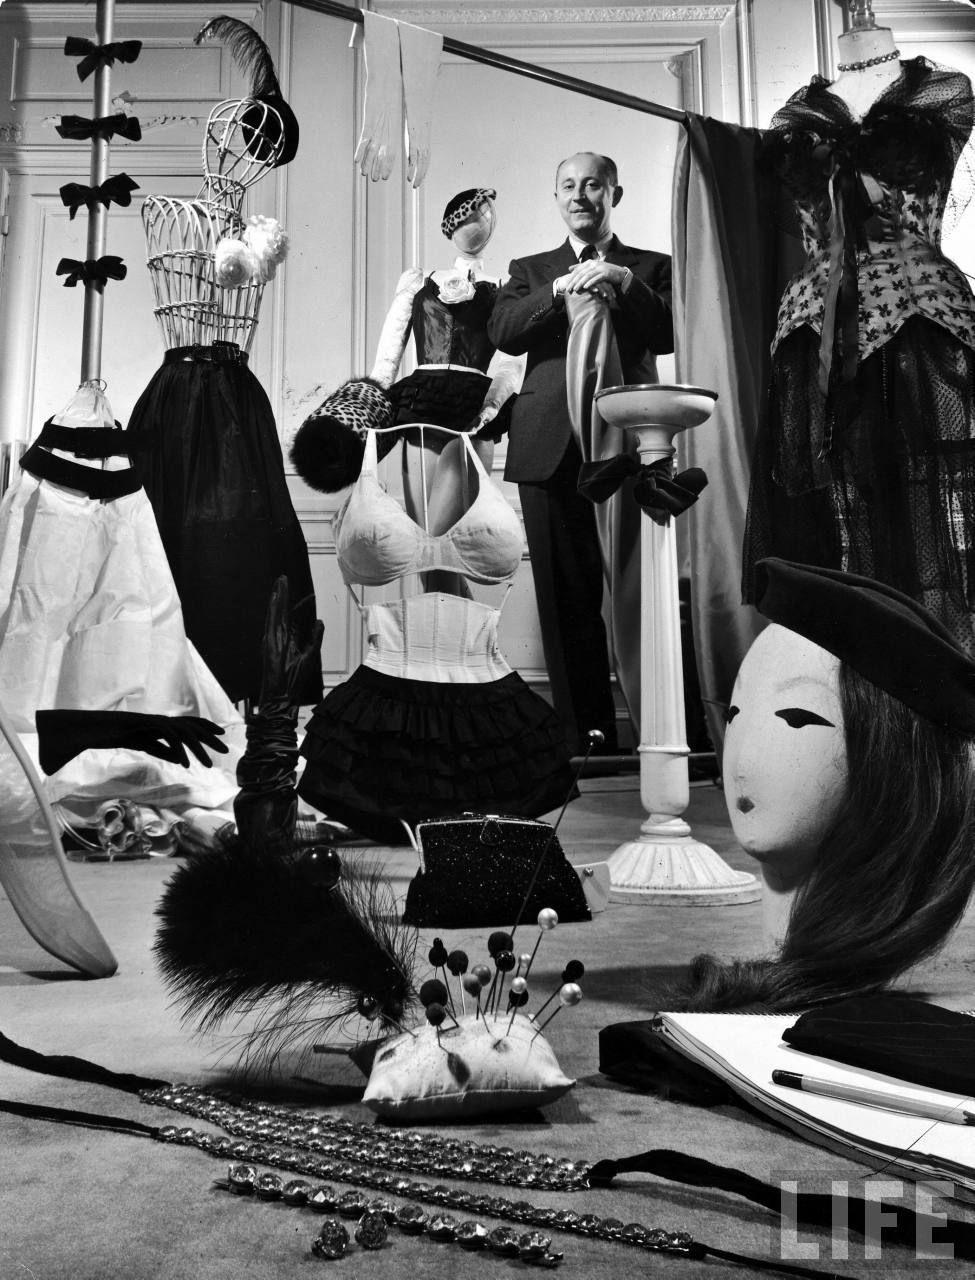 Dress designer Christian Dior in his workshop, November 1947, Photographer: Frank Scherschel.